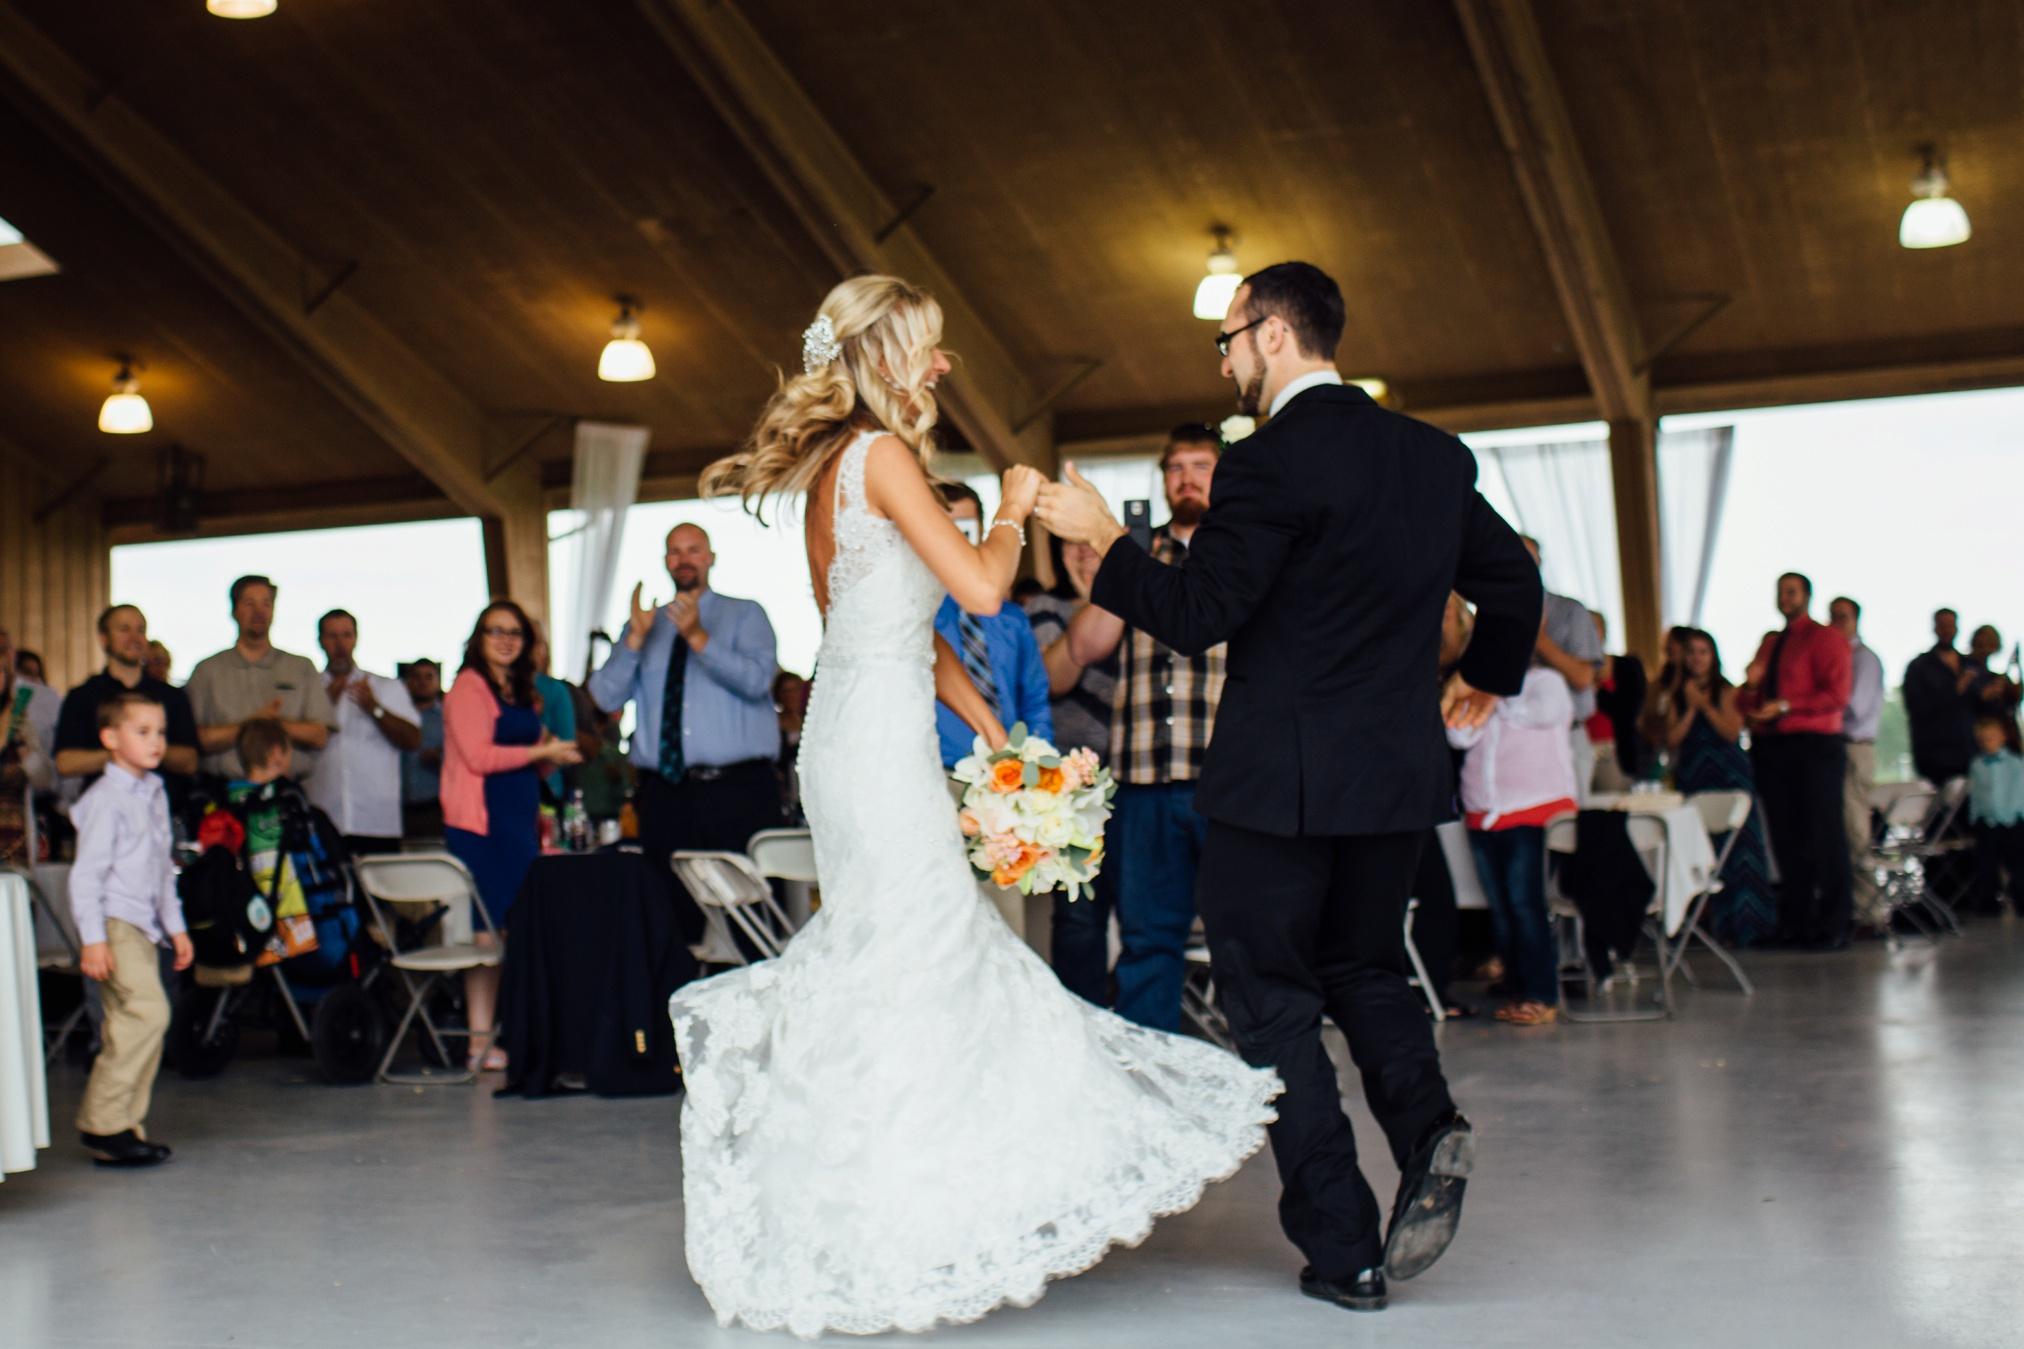 schmid_wedding-690.jpg